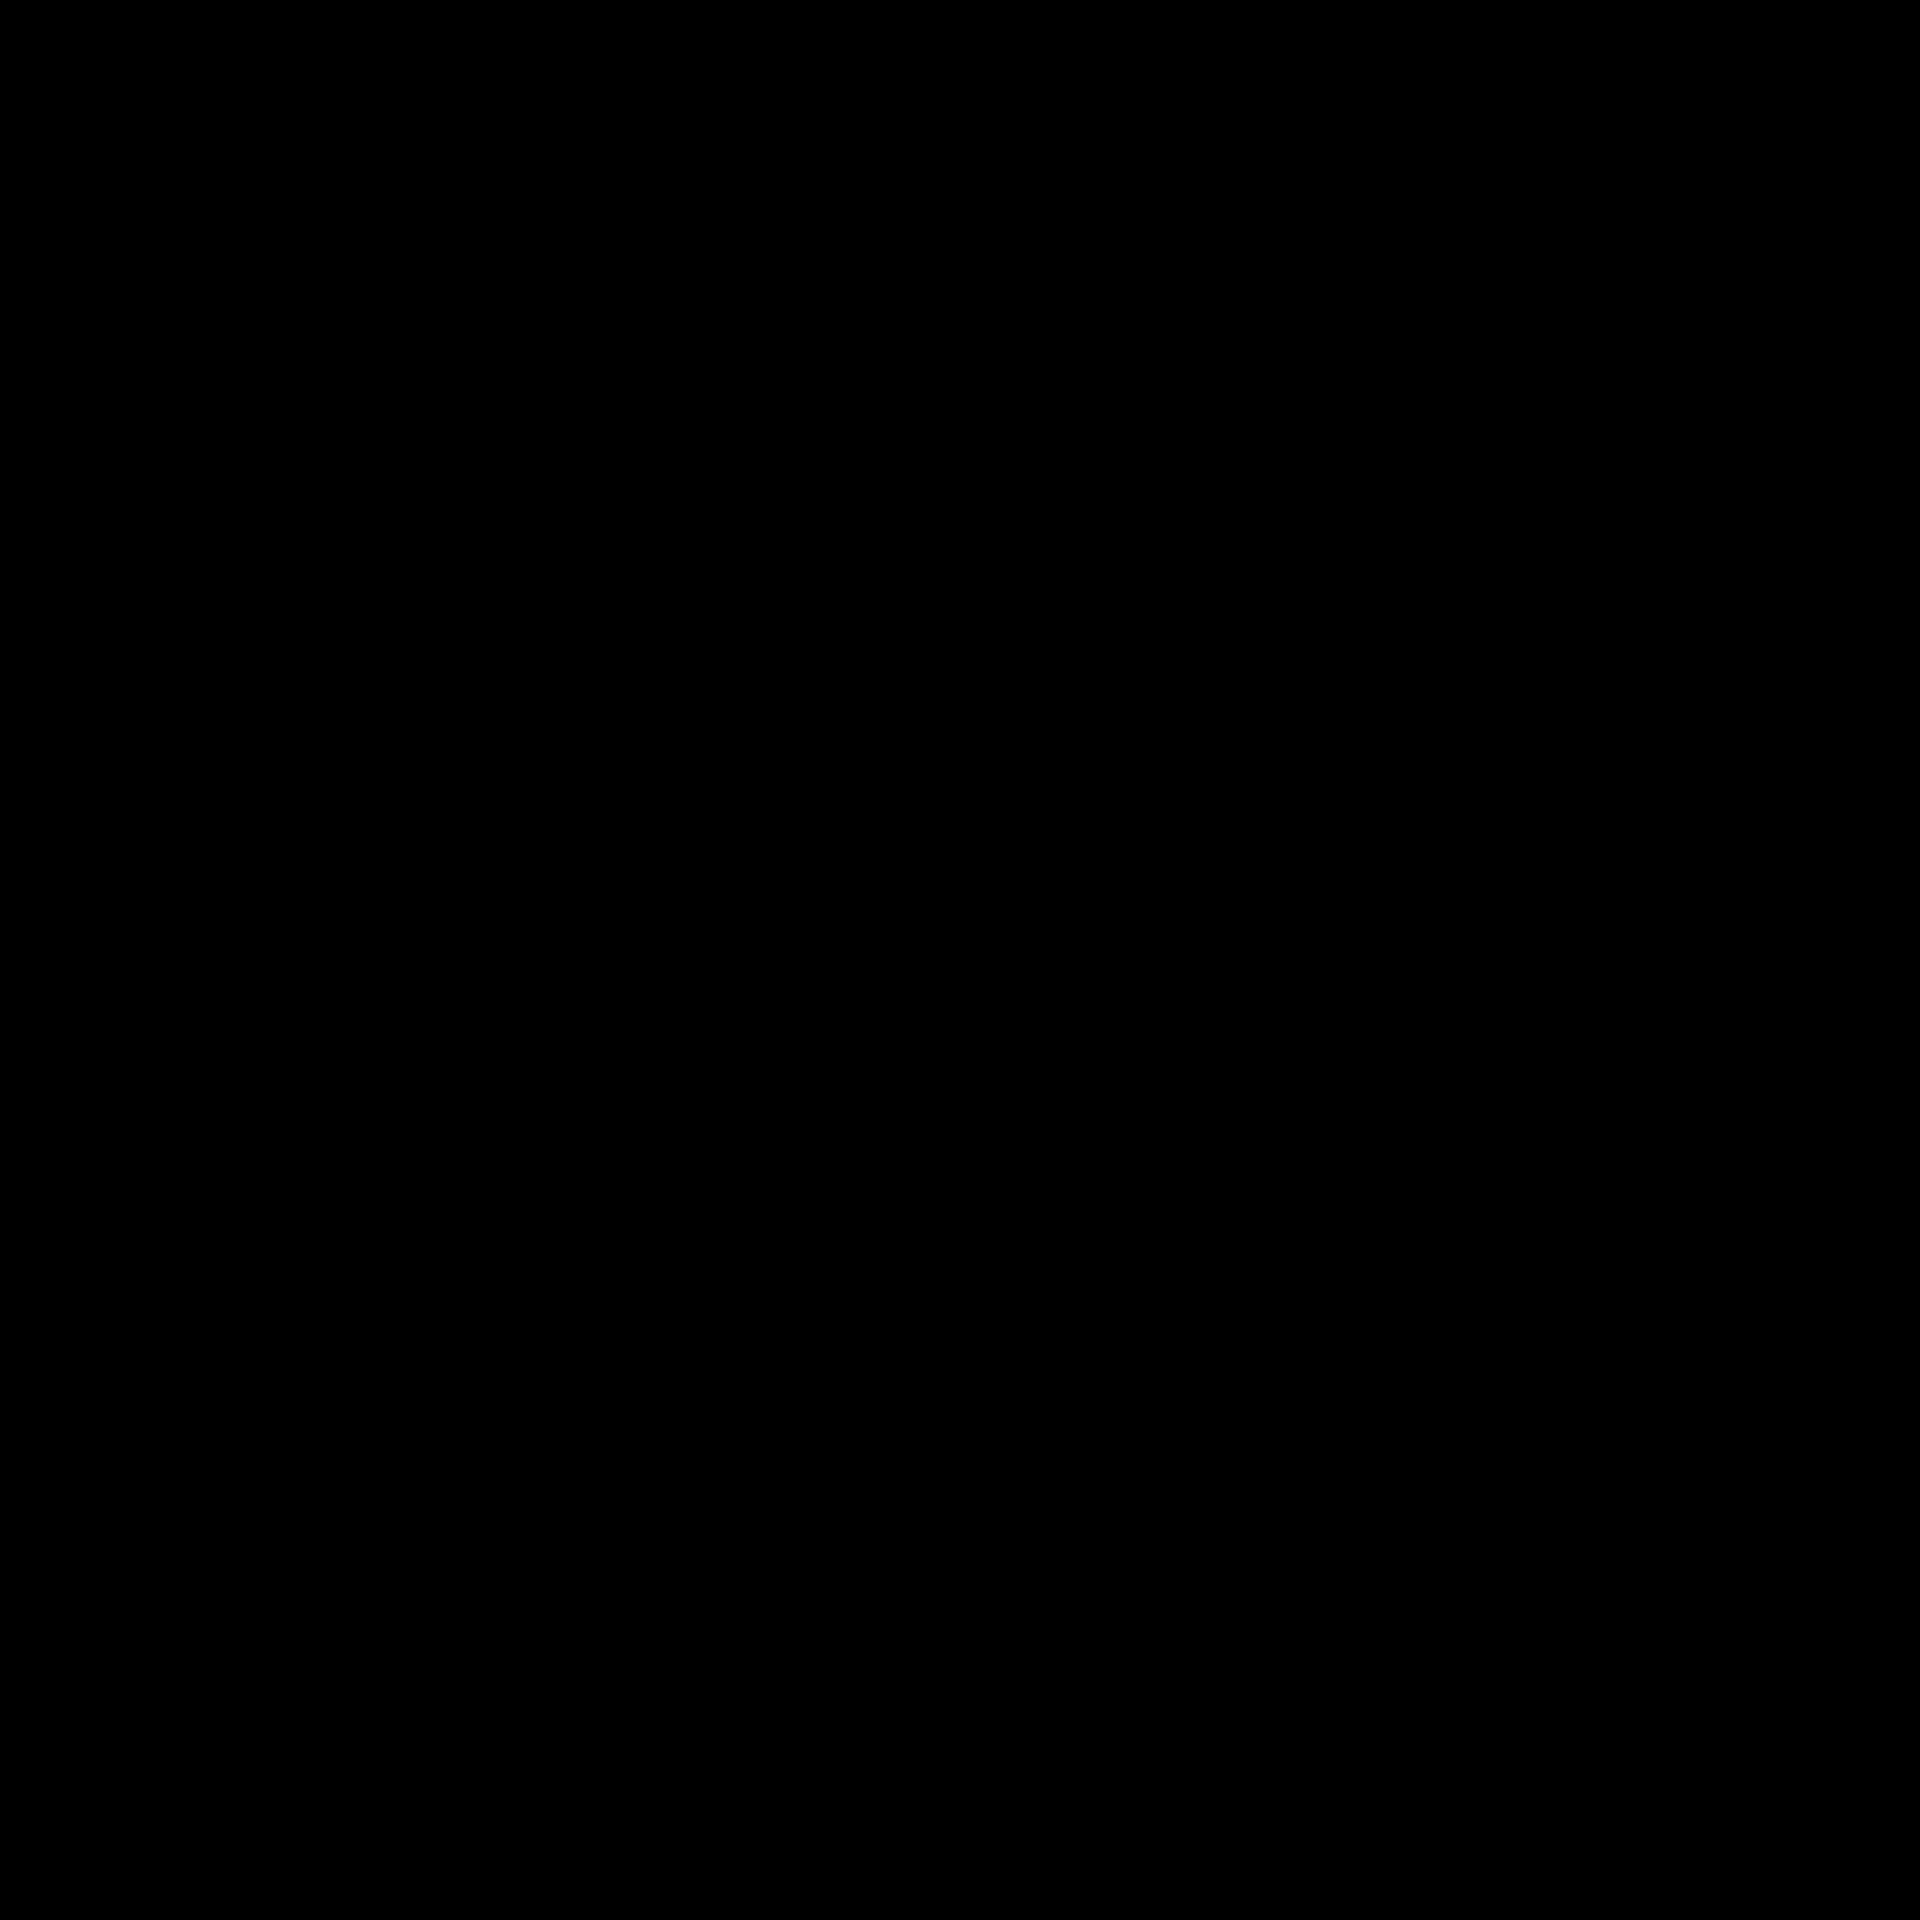 The Om Symbol In Tamil Script Aum Sign Om Symbol Art Om Tattoo Design